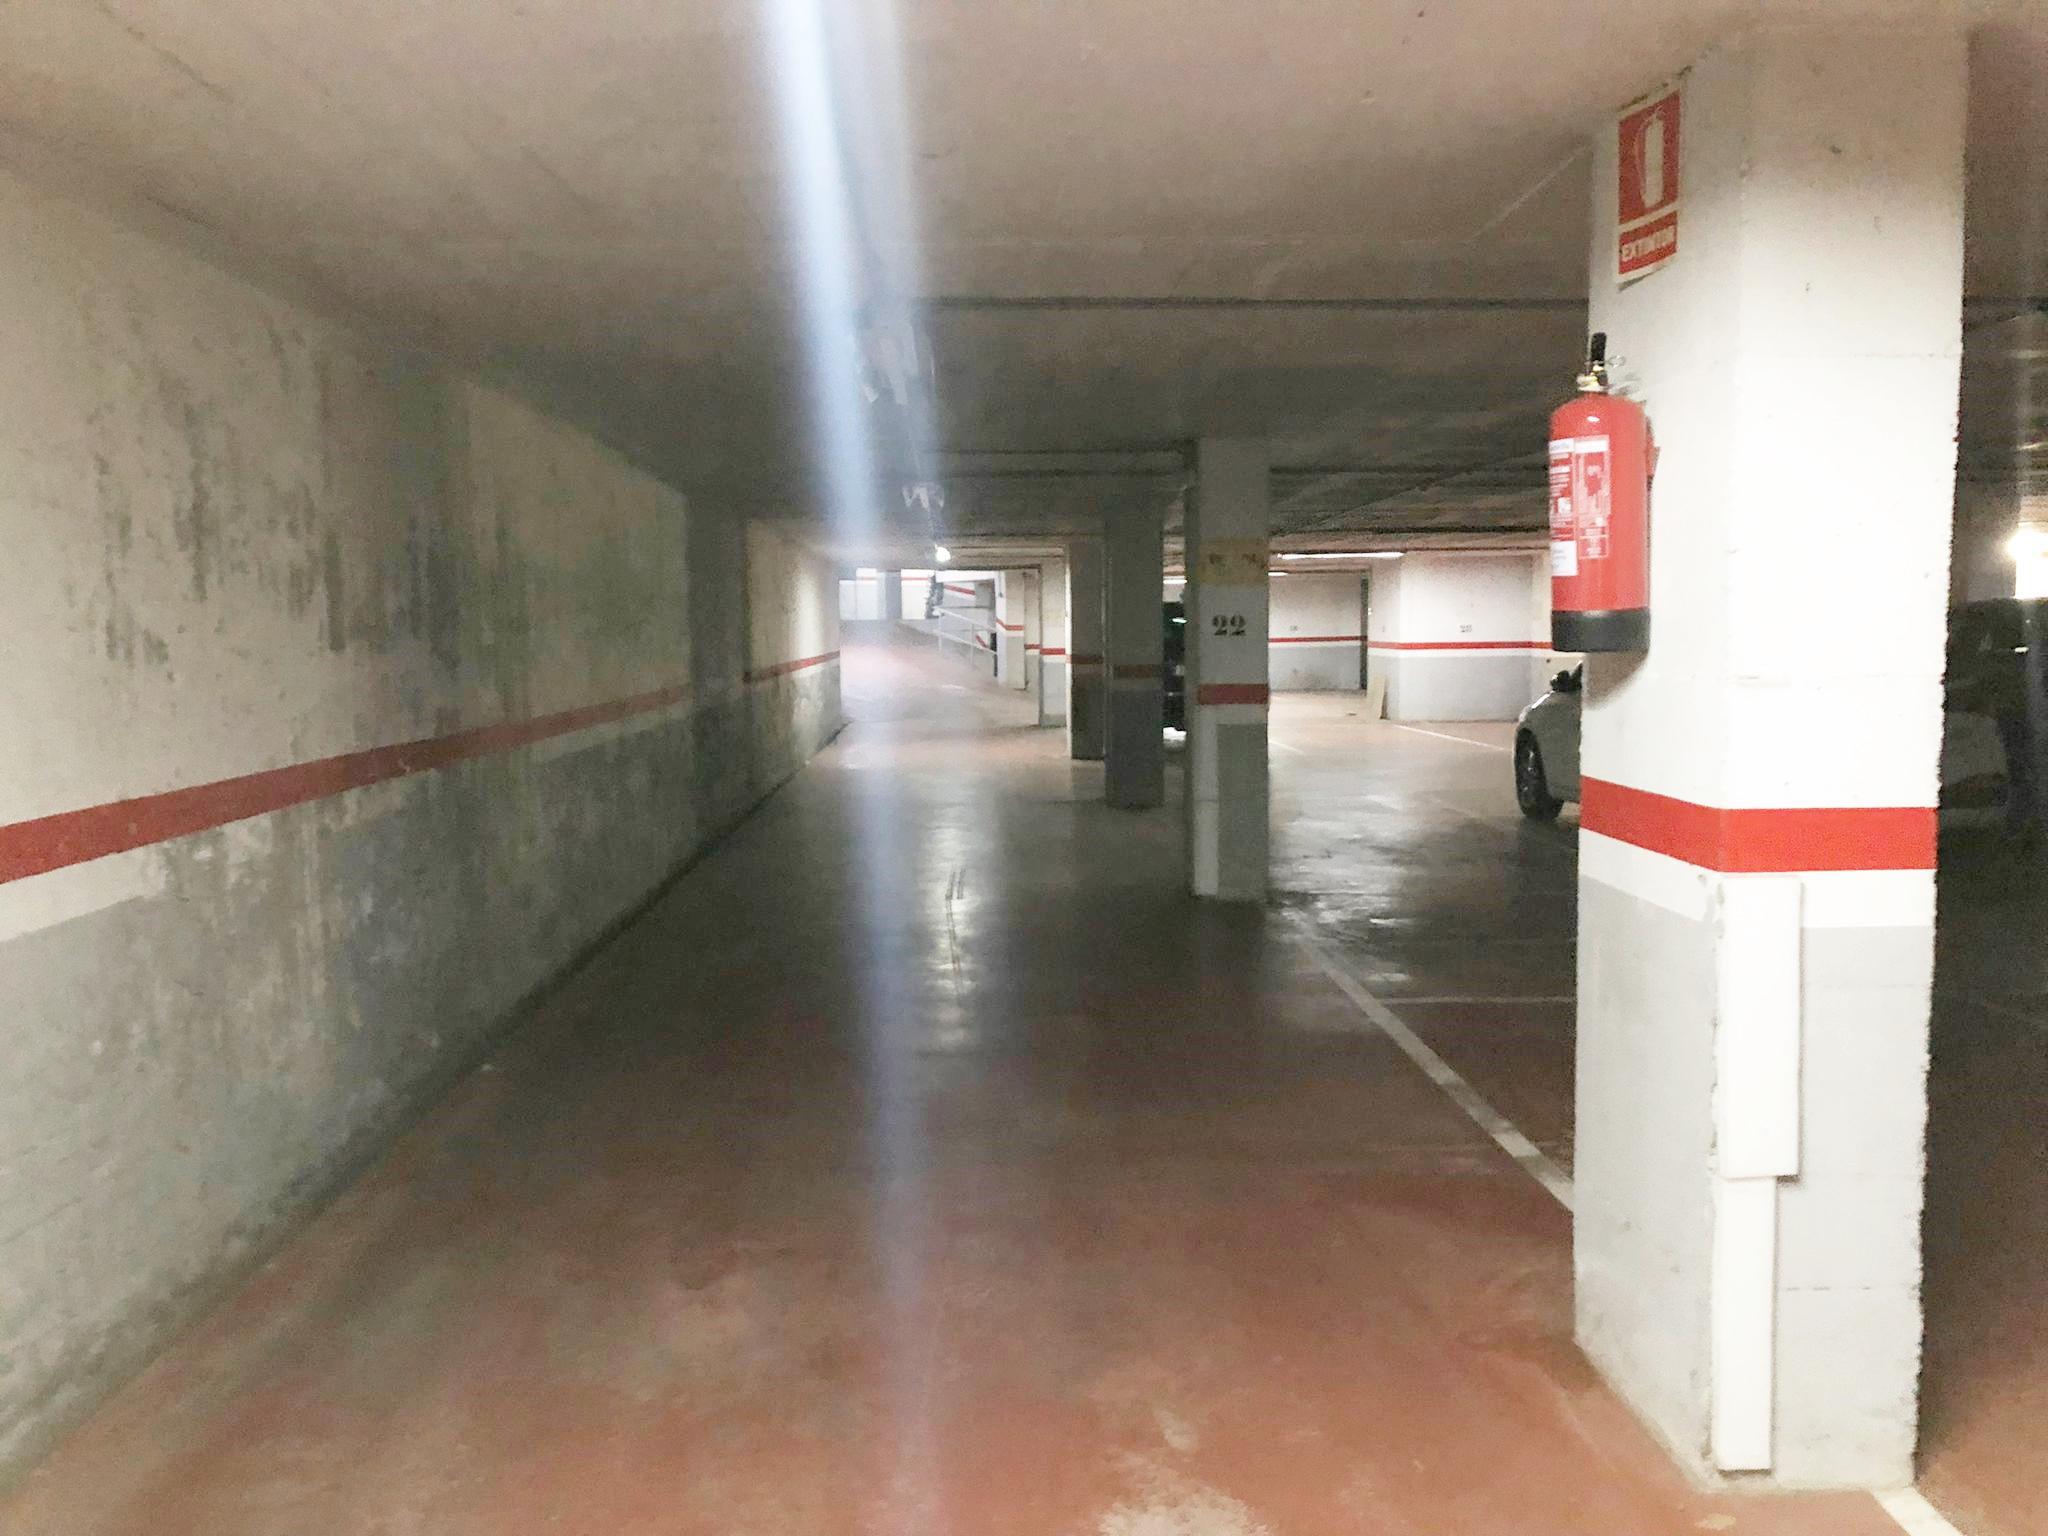 Imagen 3 Parking Coche en venta en Granollers / Calle Equador- Zona Font Verda.- Granollers